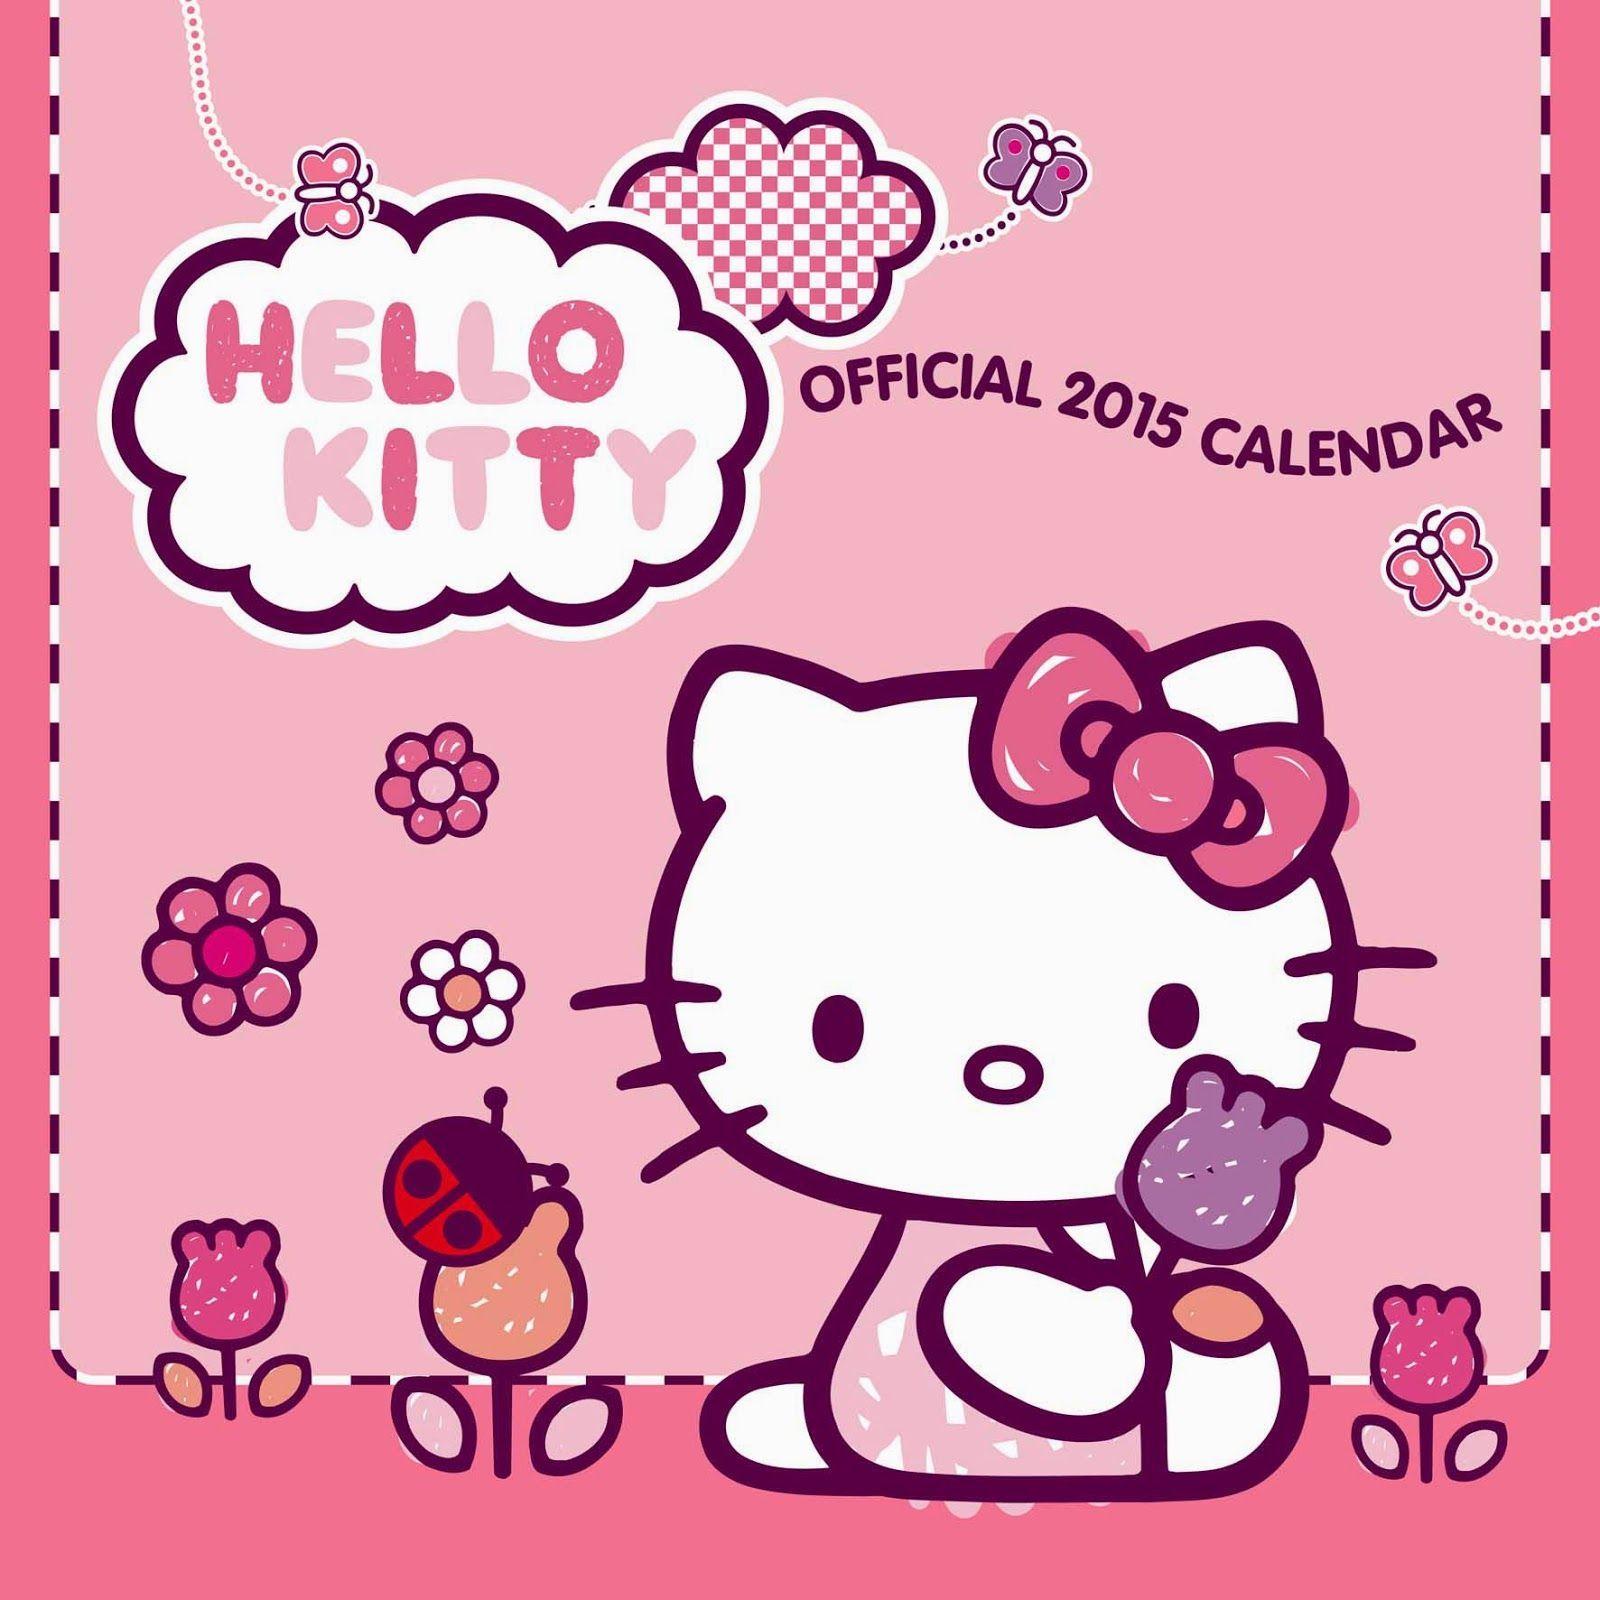 Fantastic Wallpaper Hello Kitty Calendar - dcd48f7b26c861cc91f45fb640eb9a89  Snapshot_46914.jpg